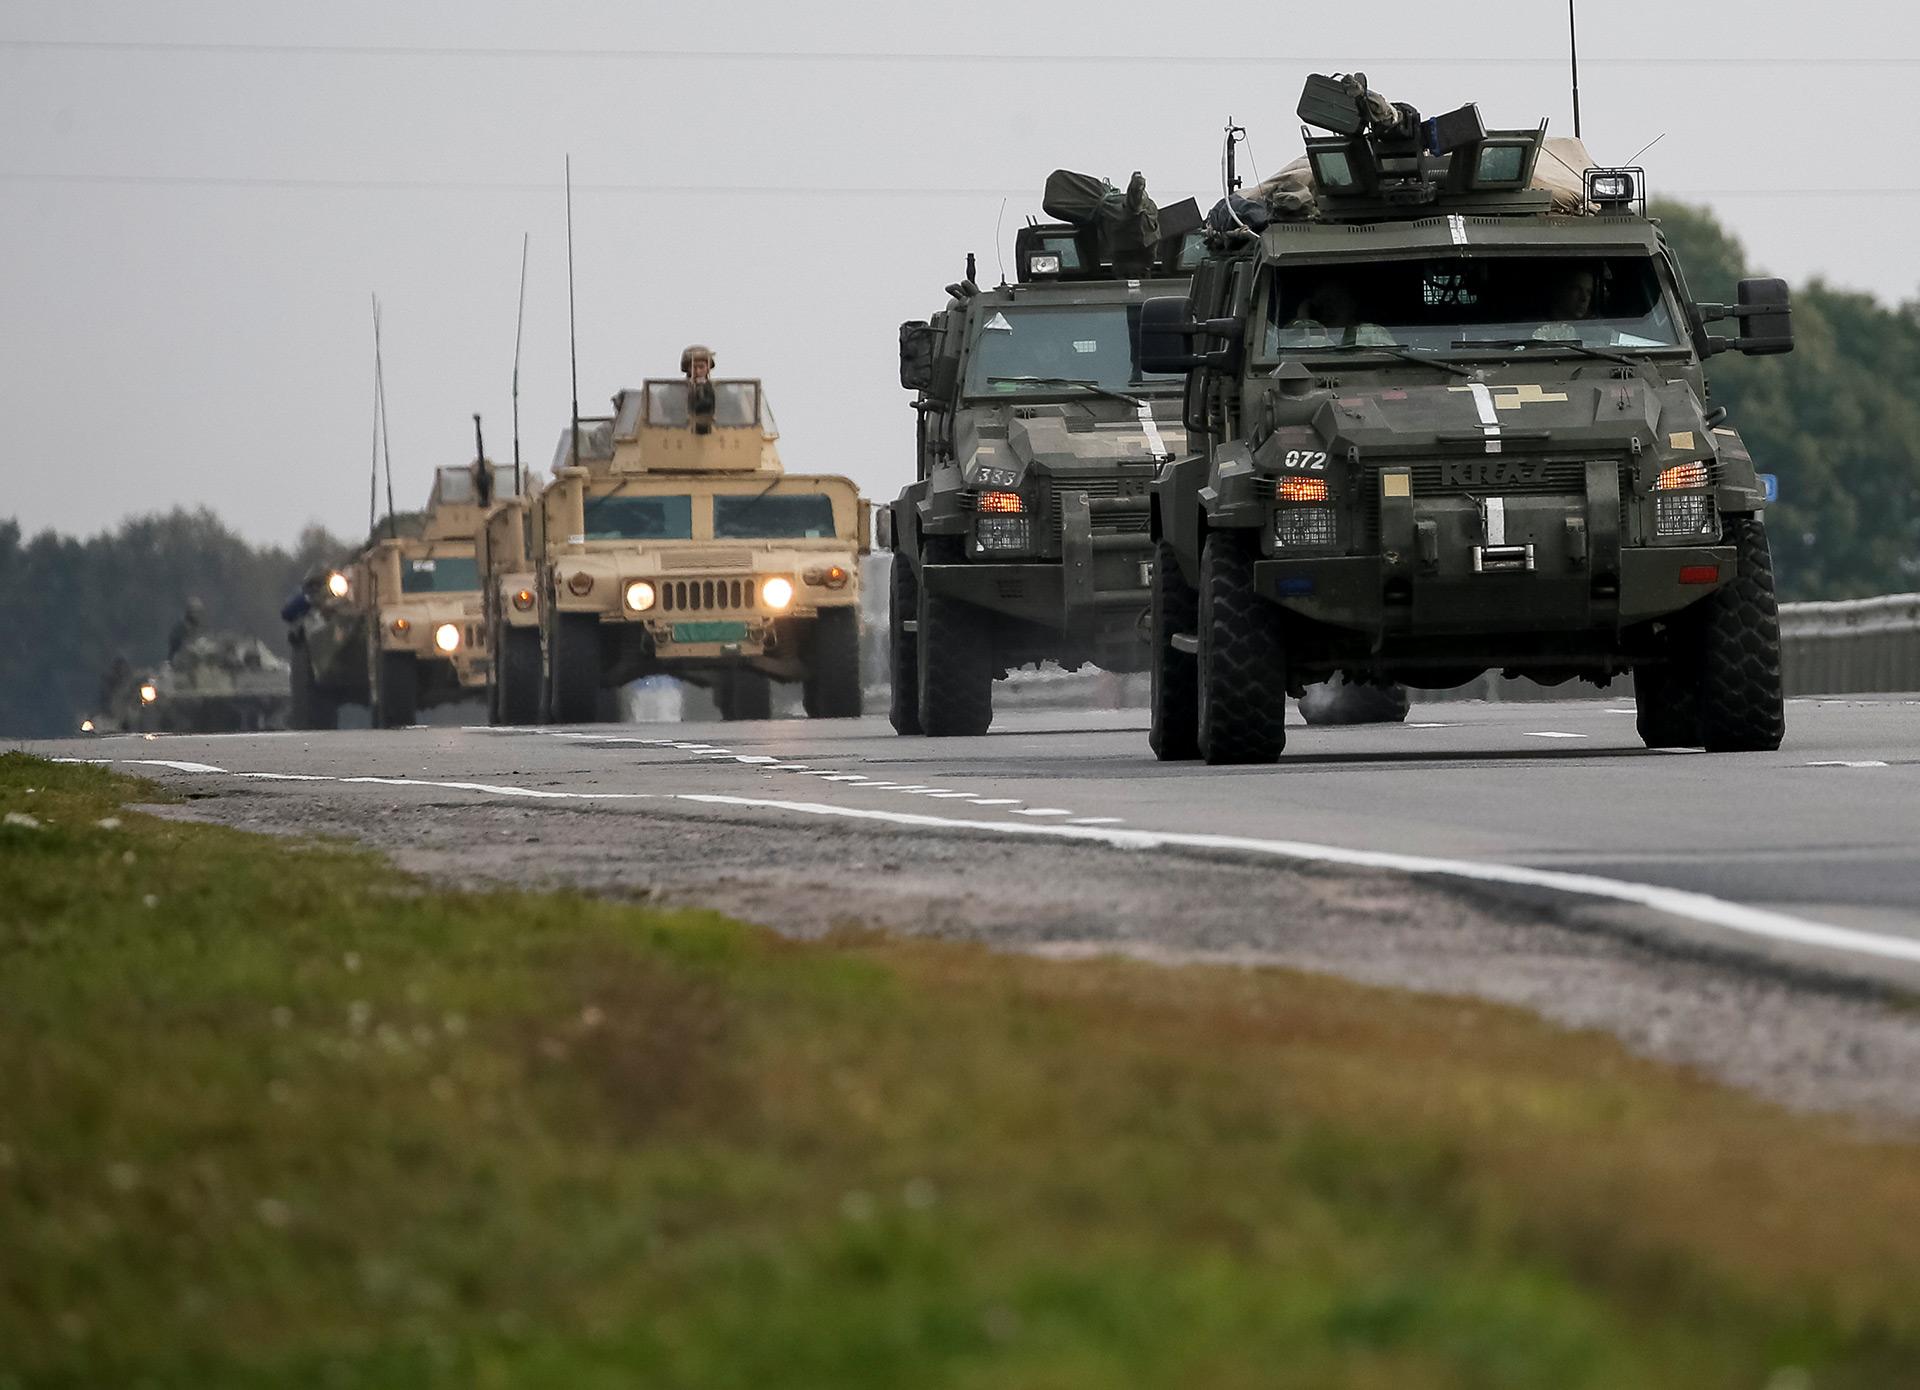 Tropas del ejército ucraniano se movilizan al almacén (Reuters)